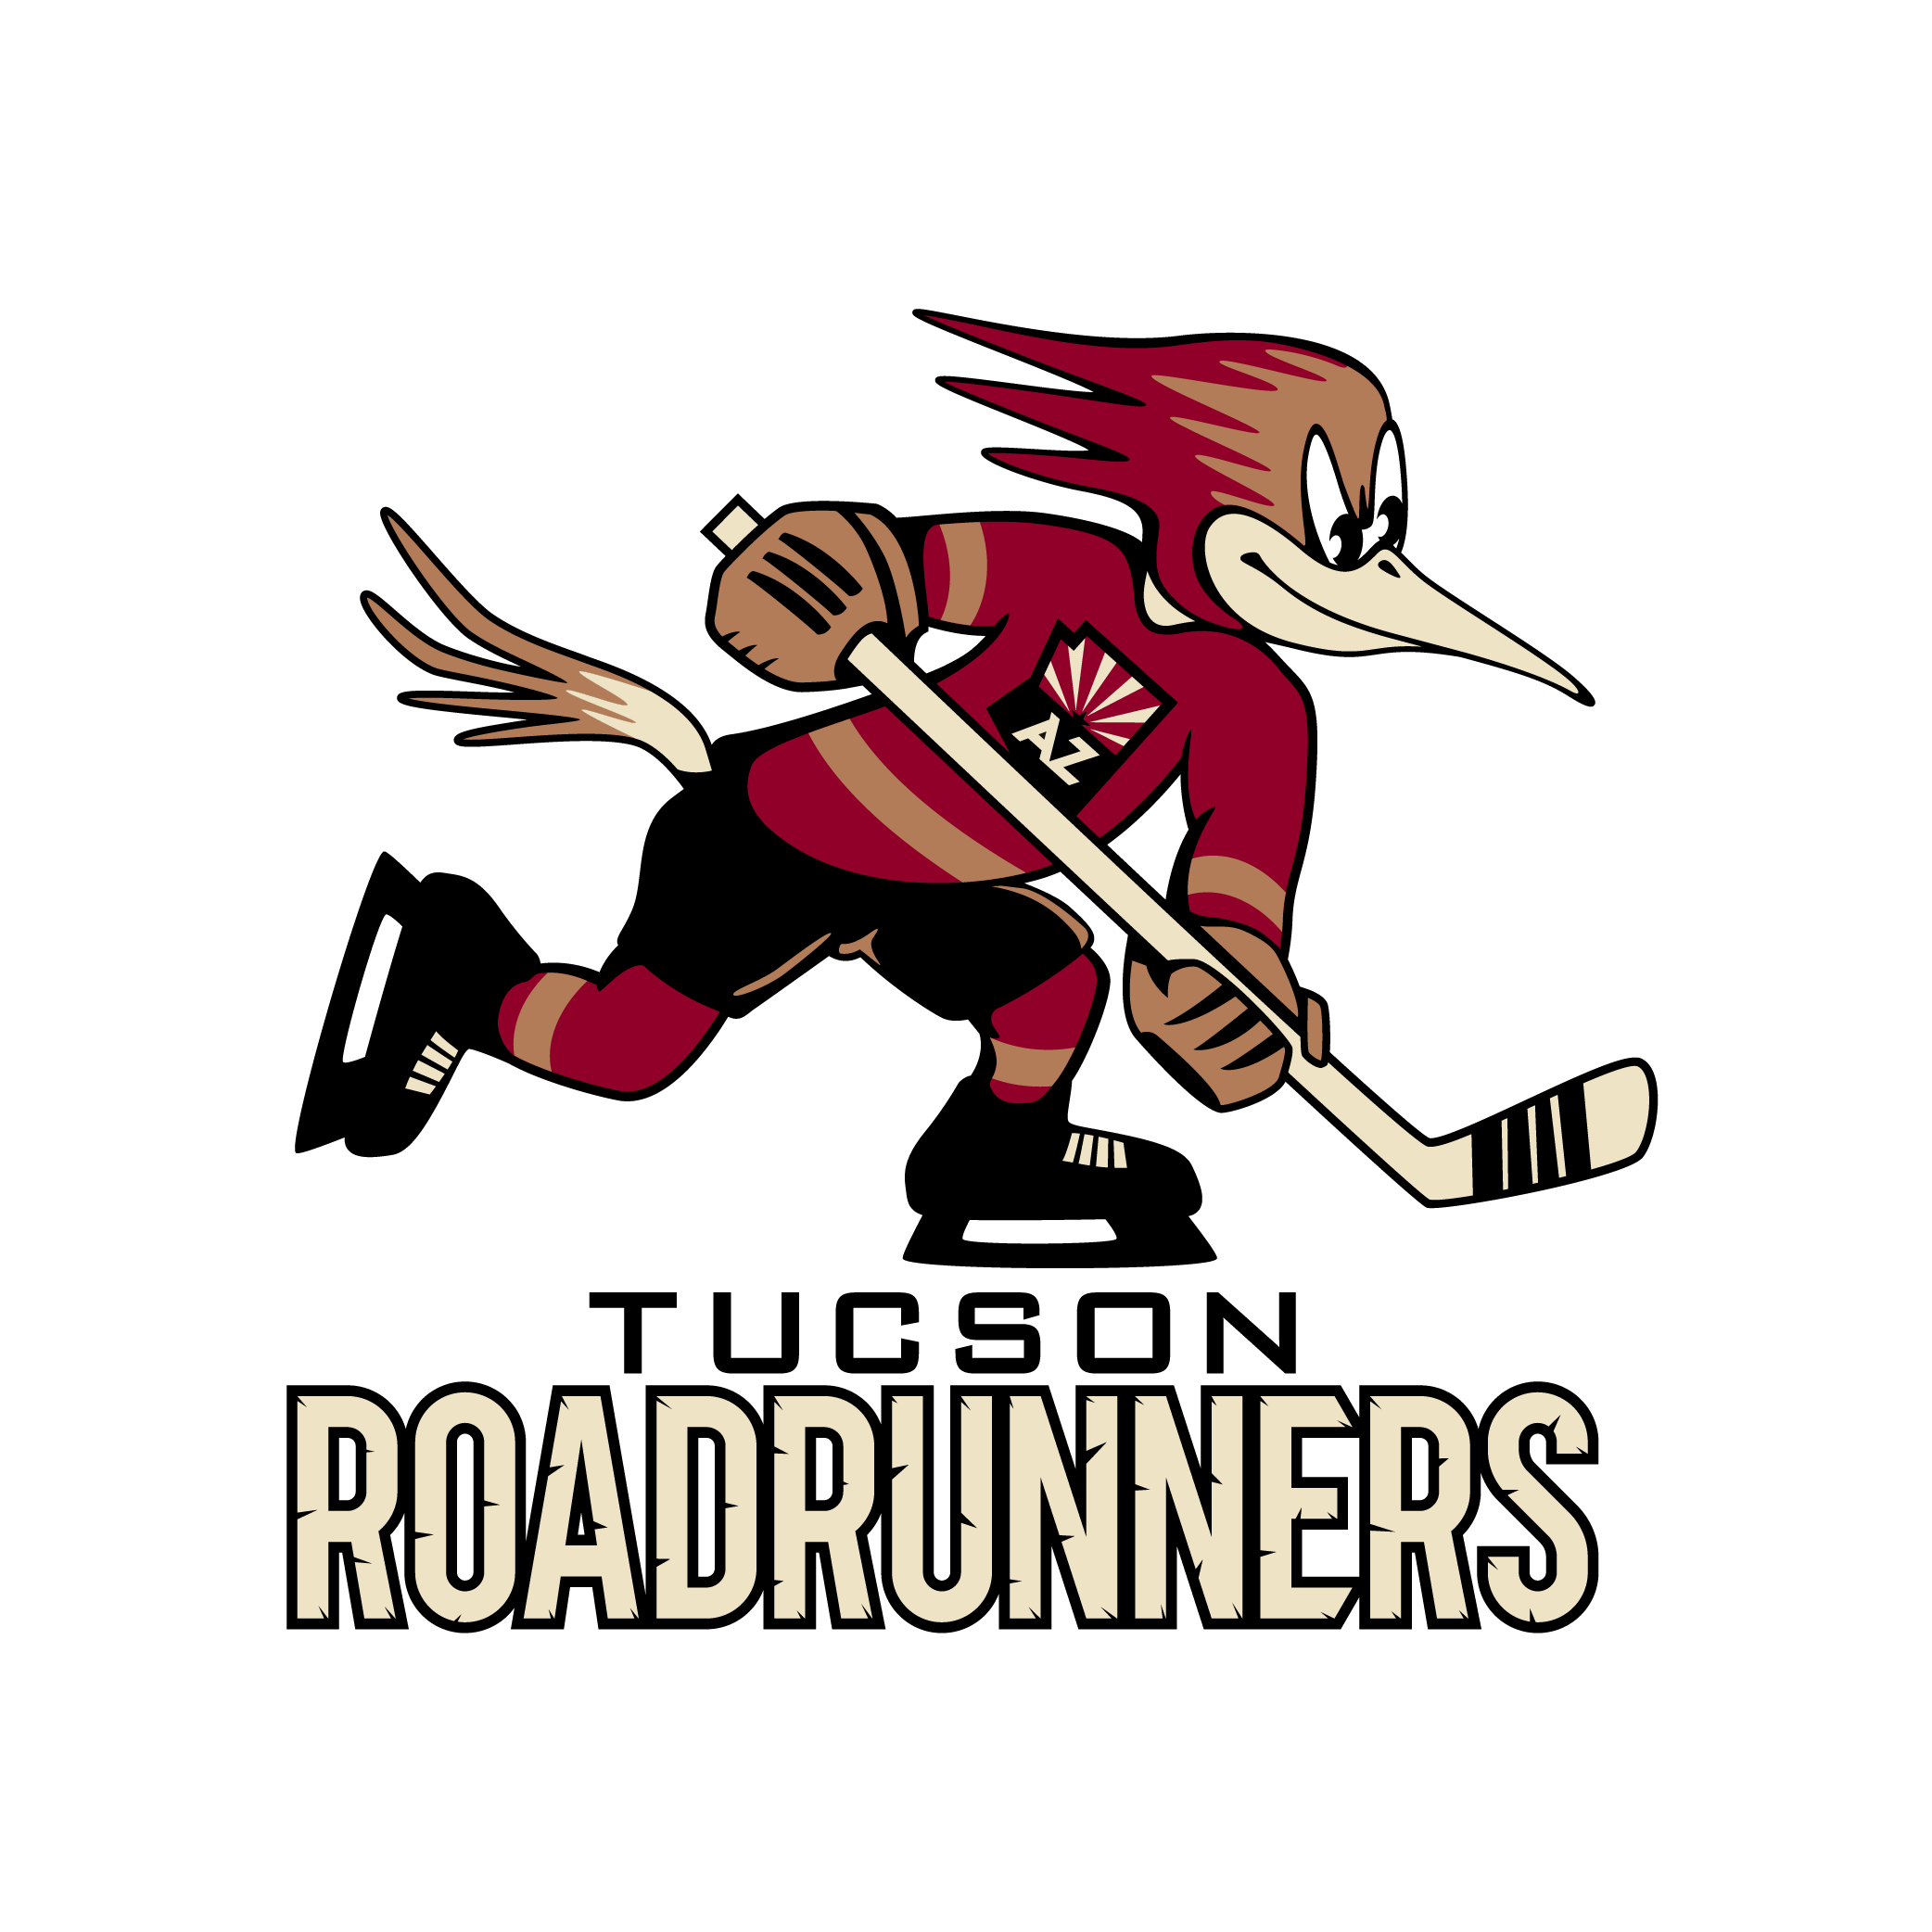 TucsonRoadrunners-01.png